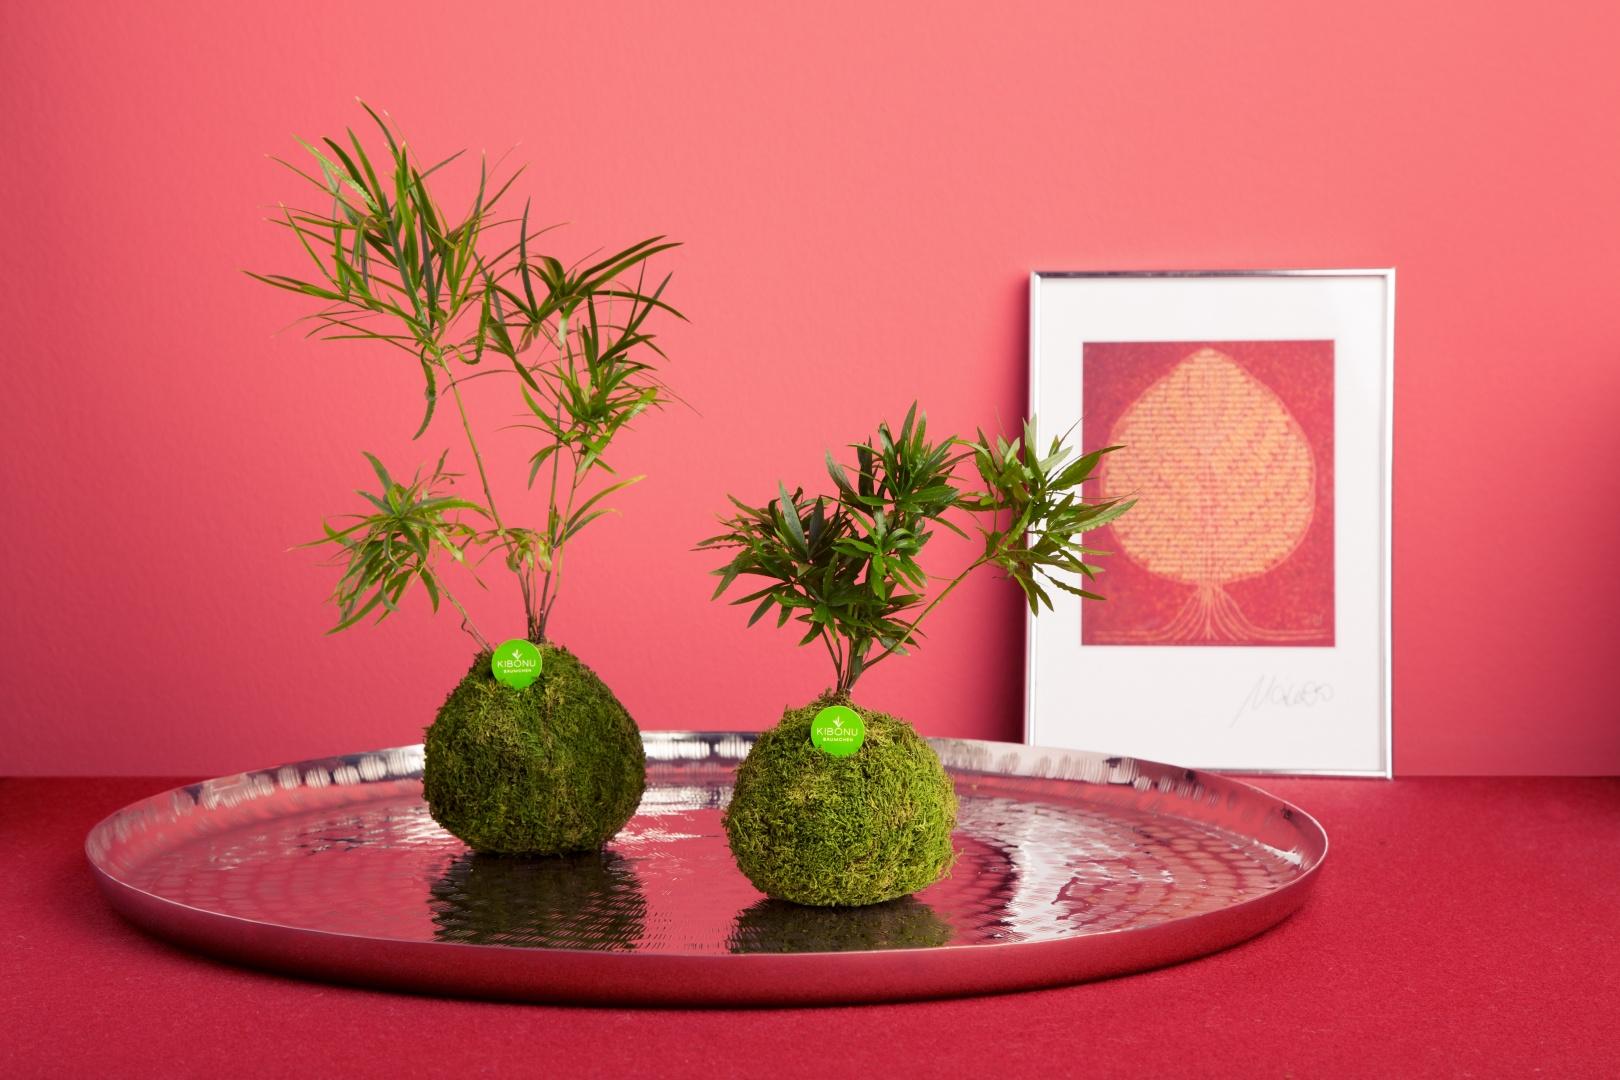 Zimmerpflanze-kibonu-bäumchen-mahira_pink